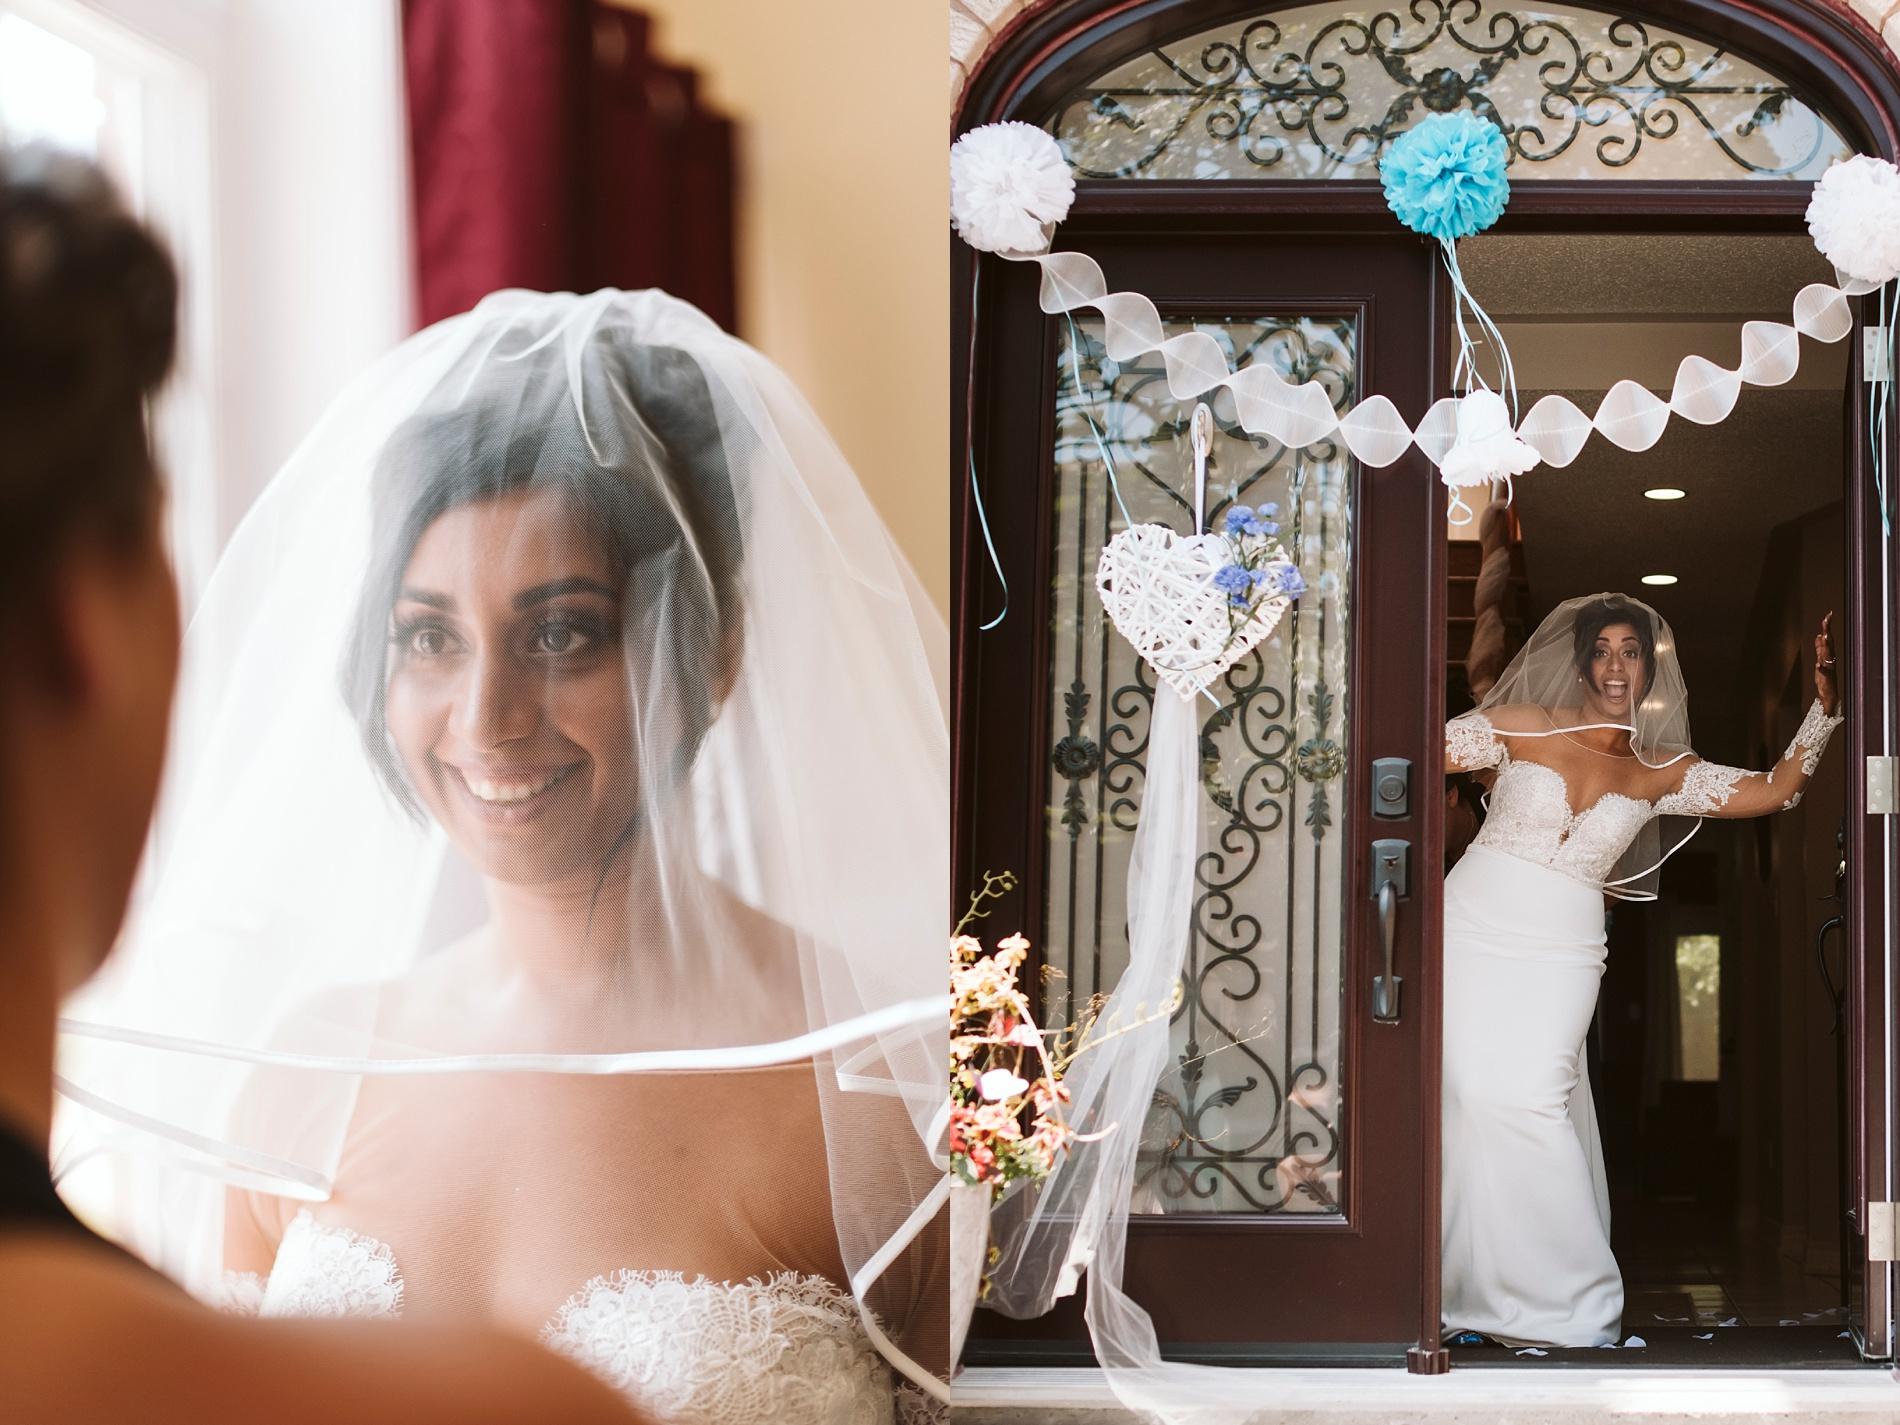 Eglington_Grand_Wedding_Photographer_0009.jpg